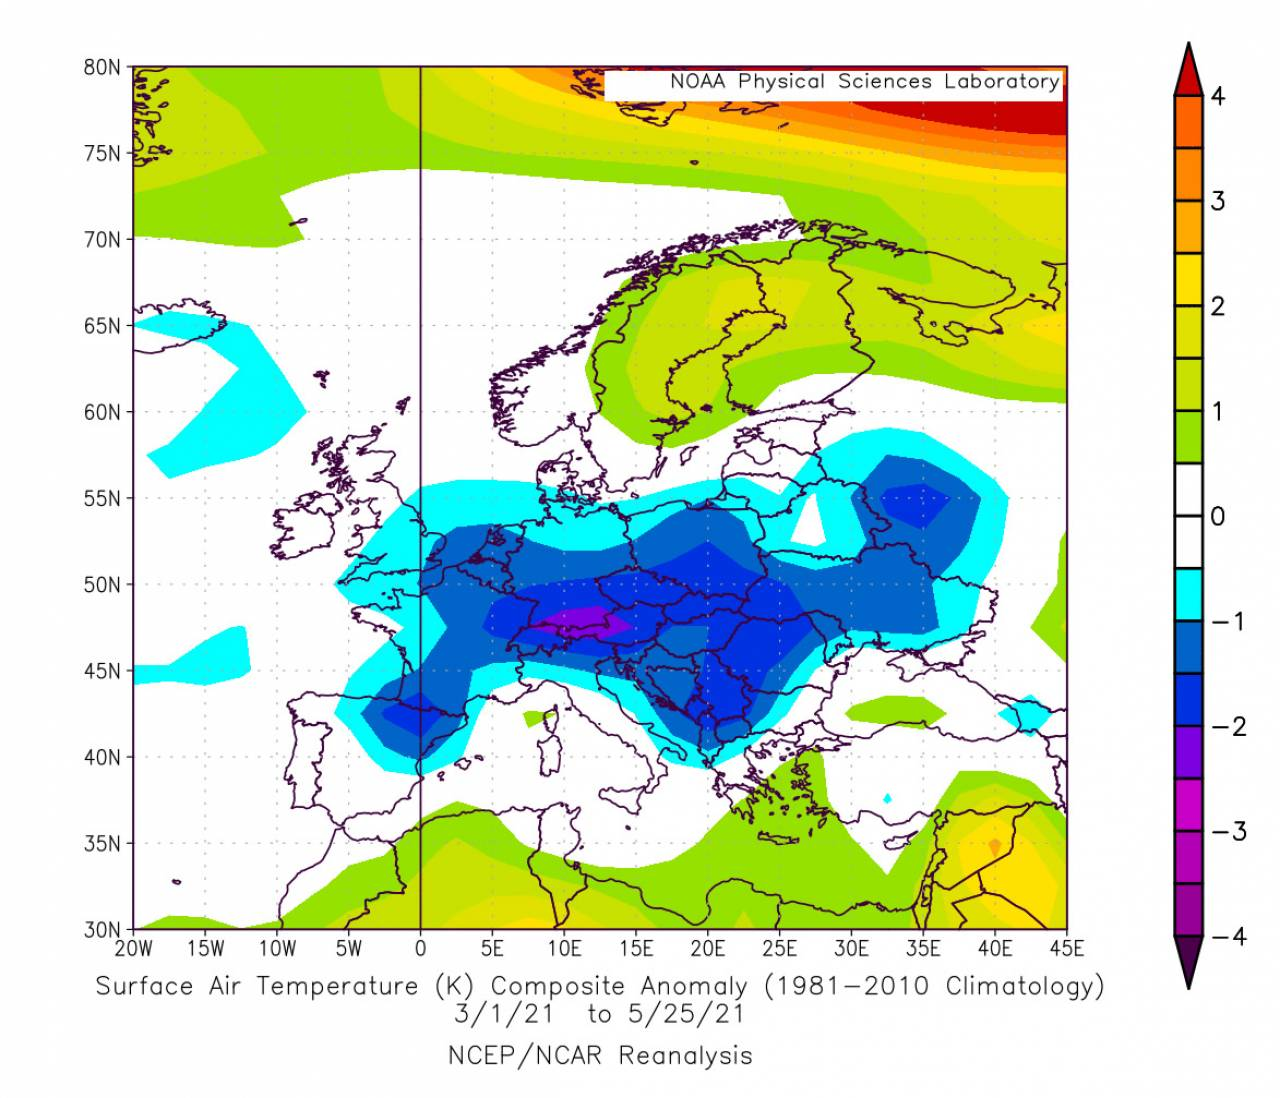 anomalie temperatura a 2m fonte Noaa